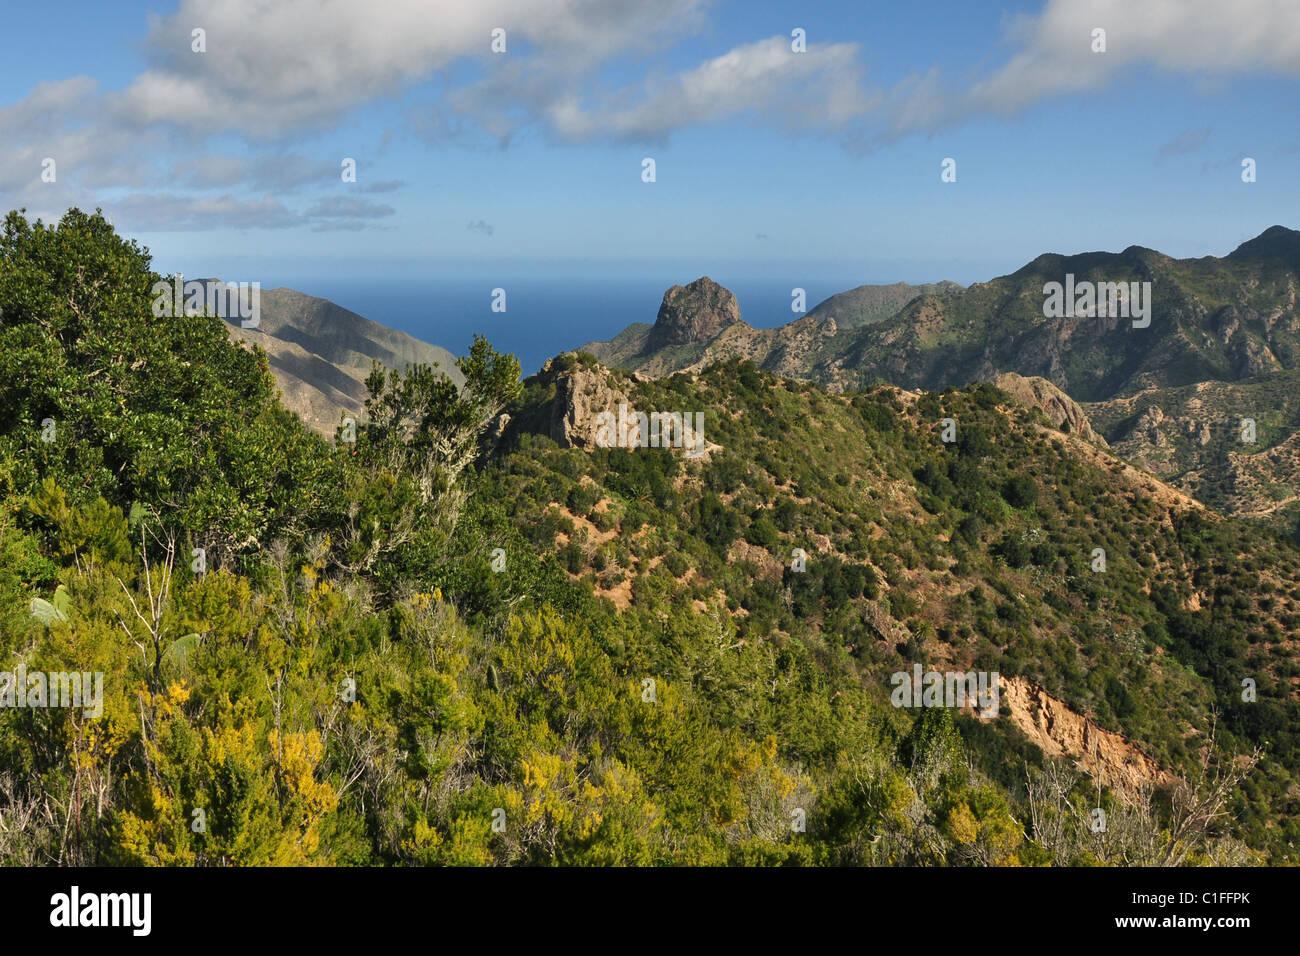 Roque Cano, Vallehermoso, La Gomera, Canary Islands, Spain - Stock Image